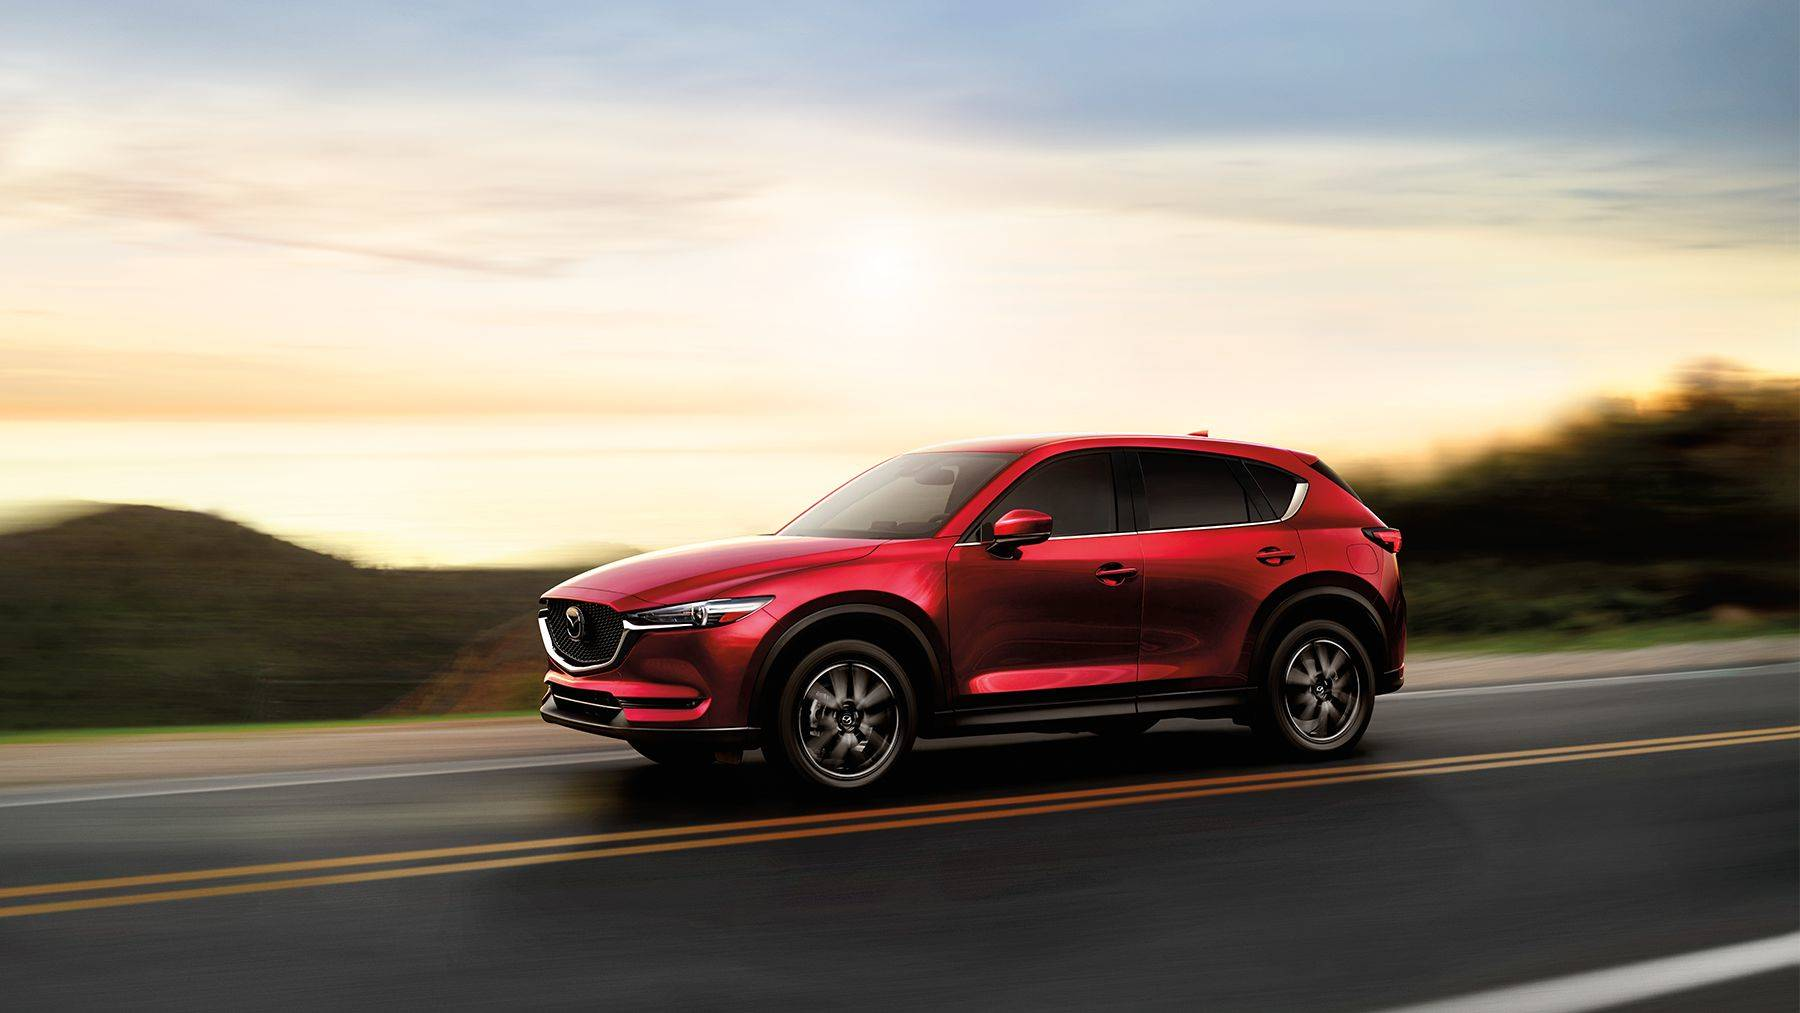 2018 Mazda CX-5 Leasing in New Braunfels, TX